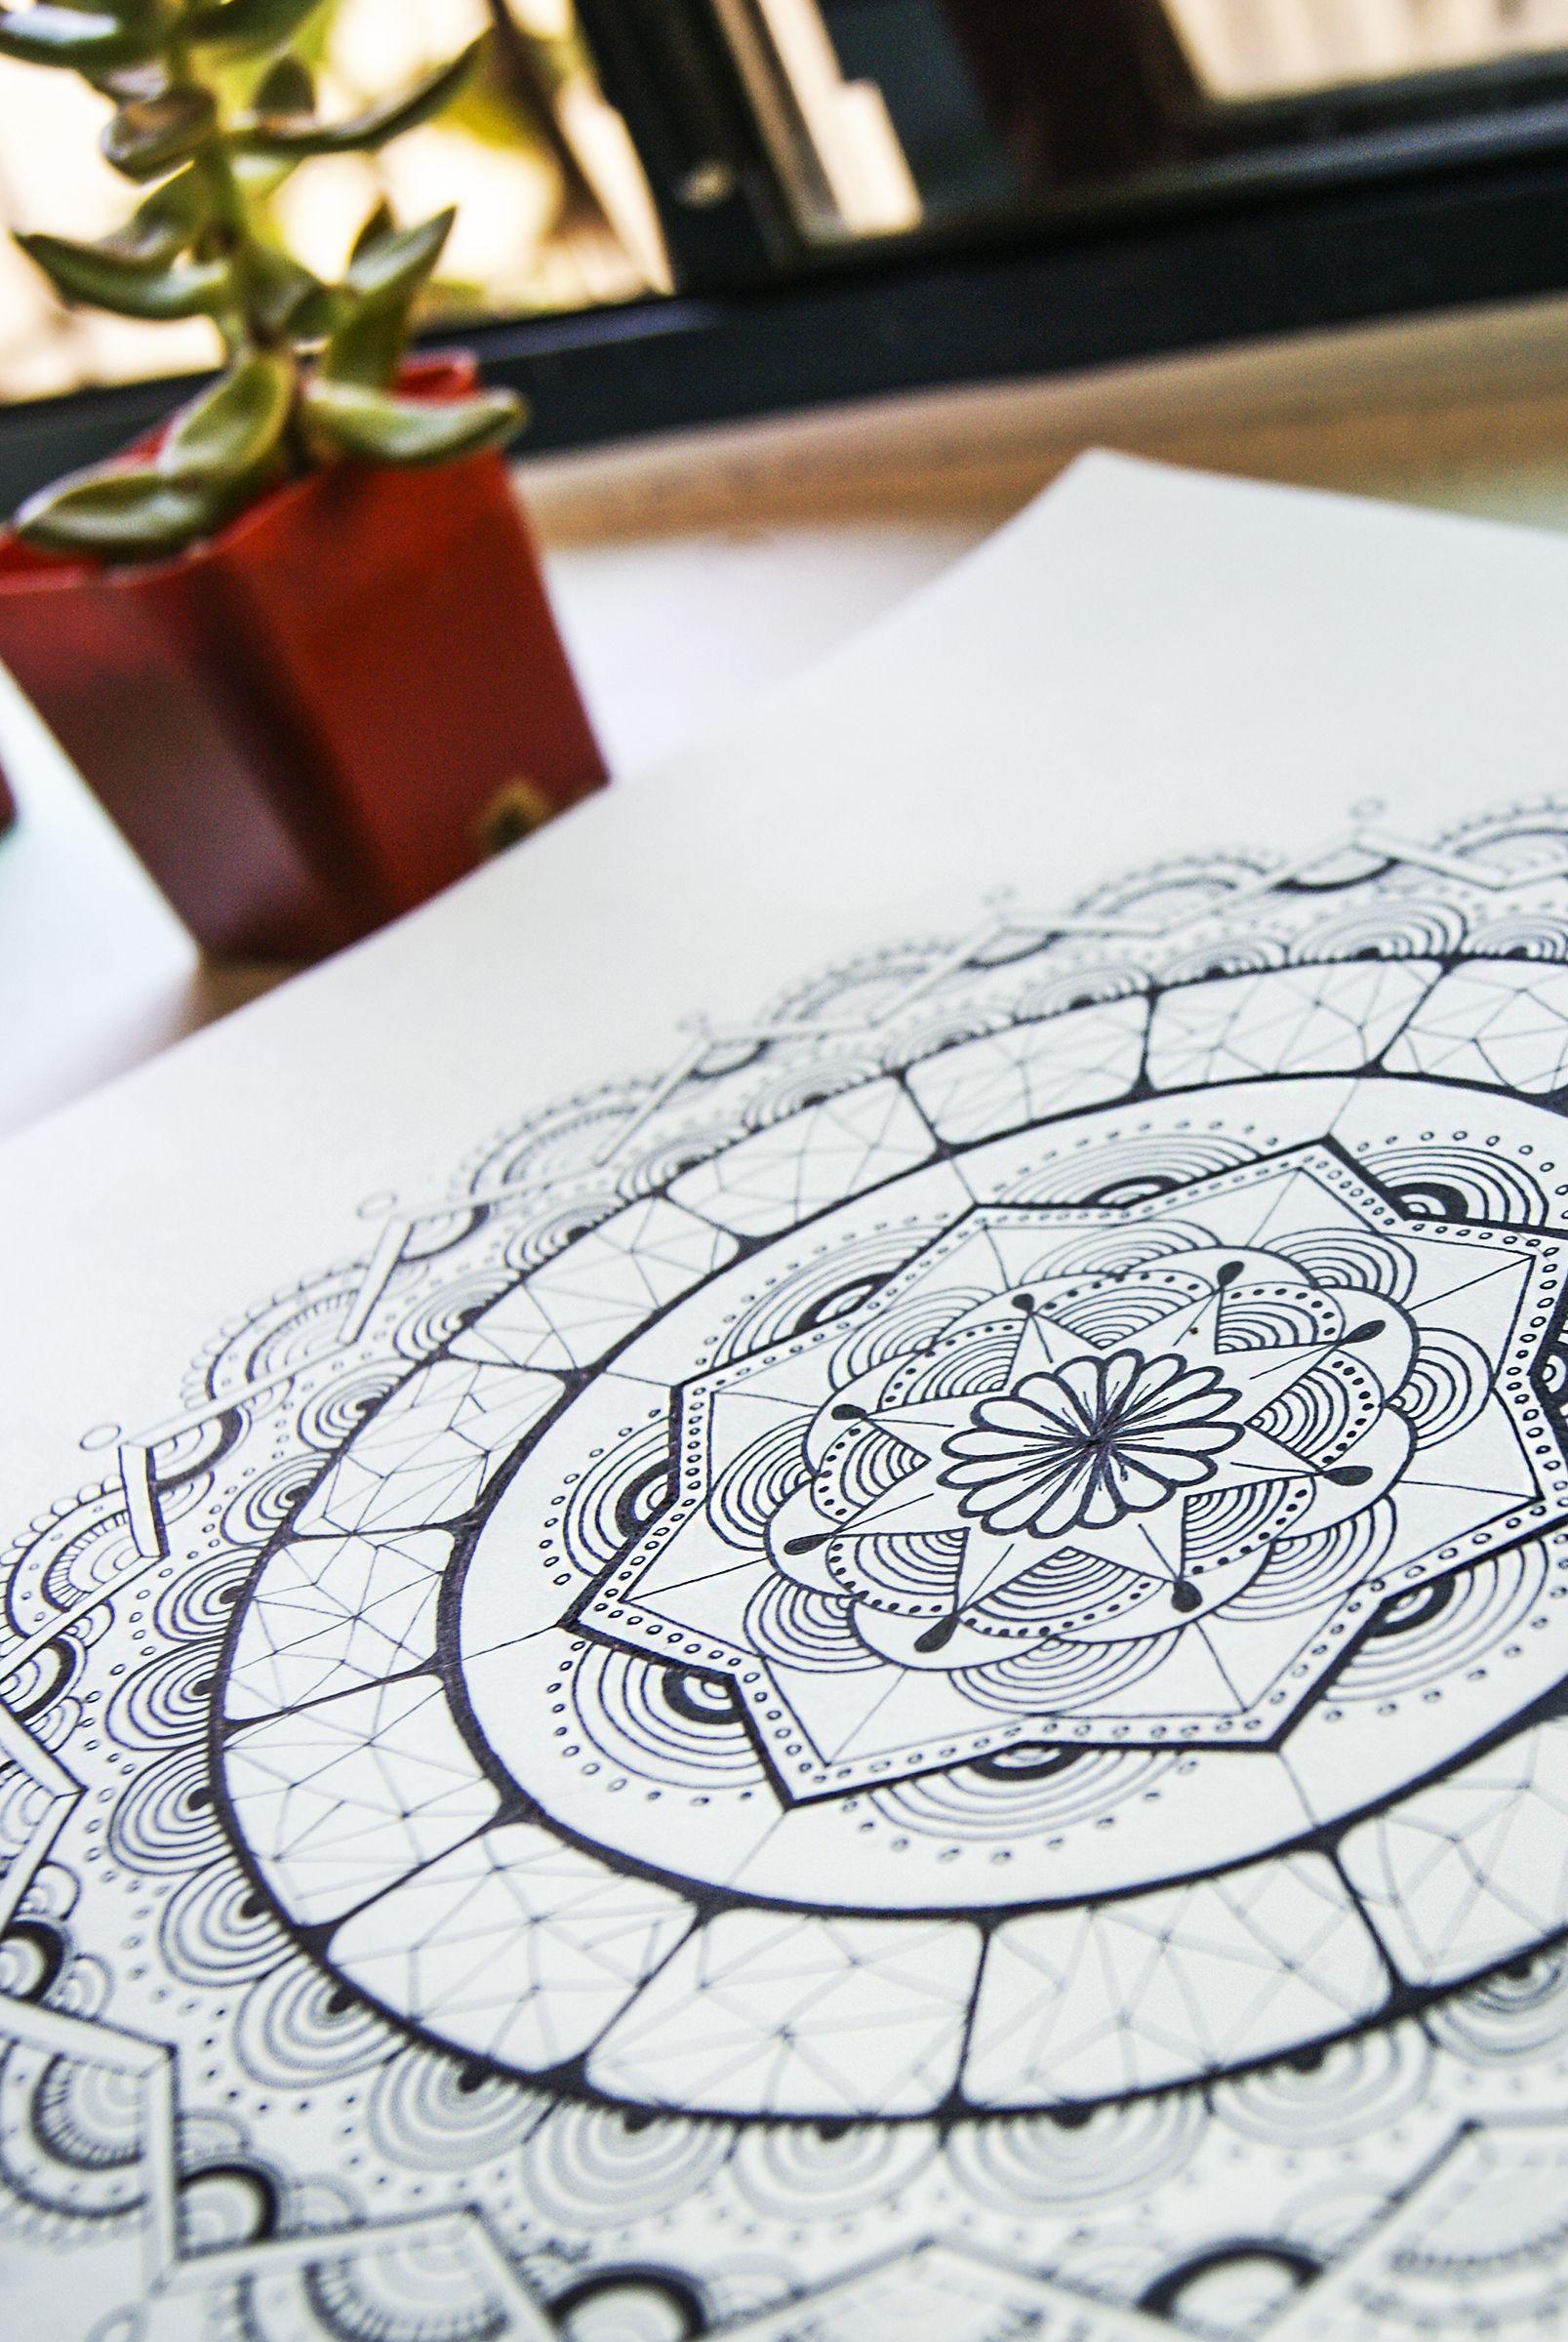 Mandala, arte trascendental, arte espiritual, arte de alma.   Geometría de vida, geometría del universo interior.